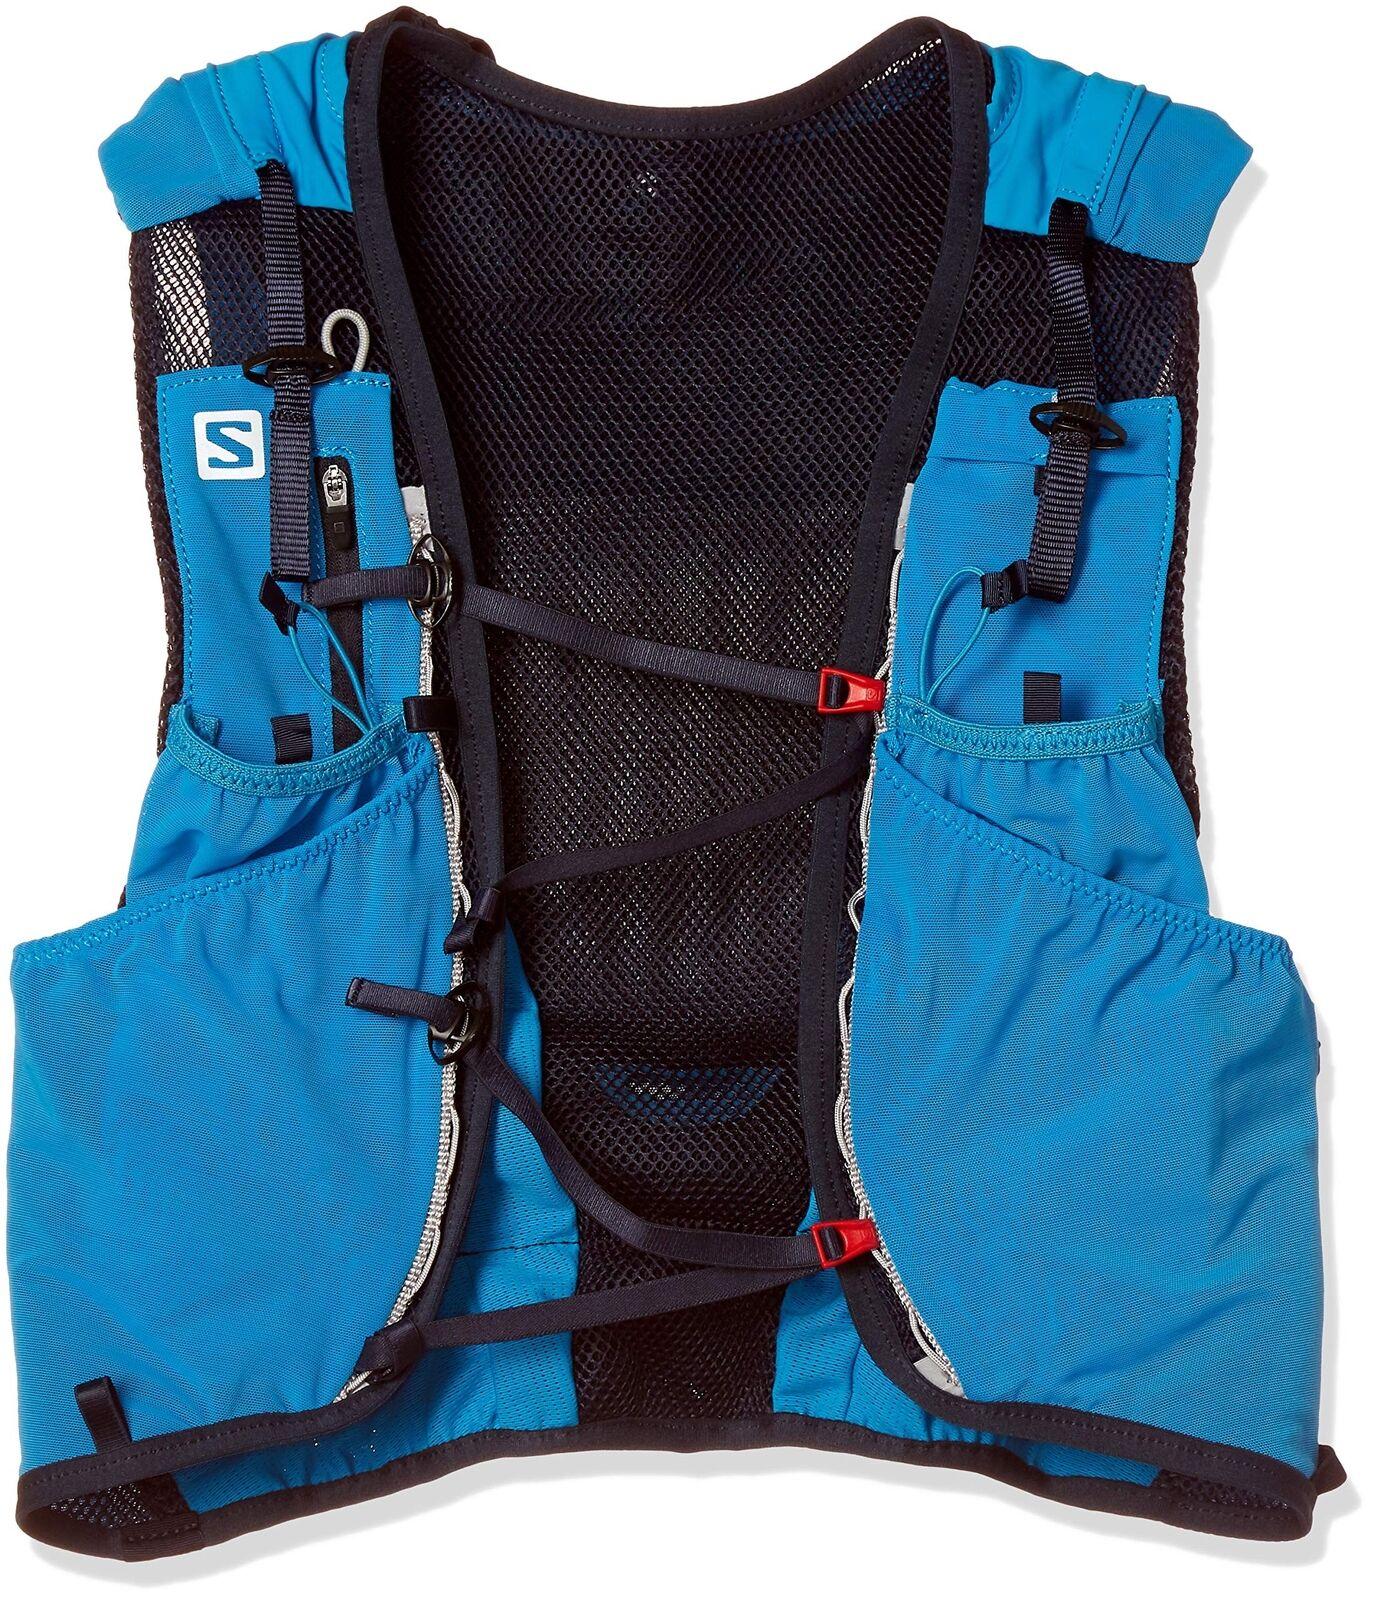 Salomon avanzate di pelle 12 Set leggero Idratazione Pack, 12 LITRI Medium Large